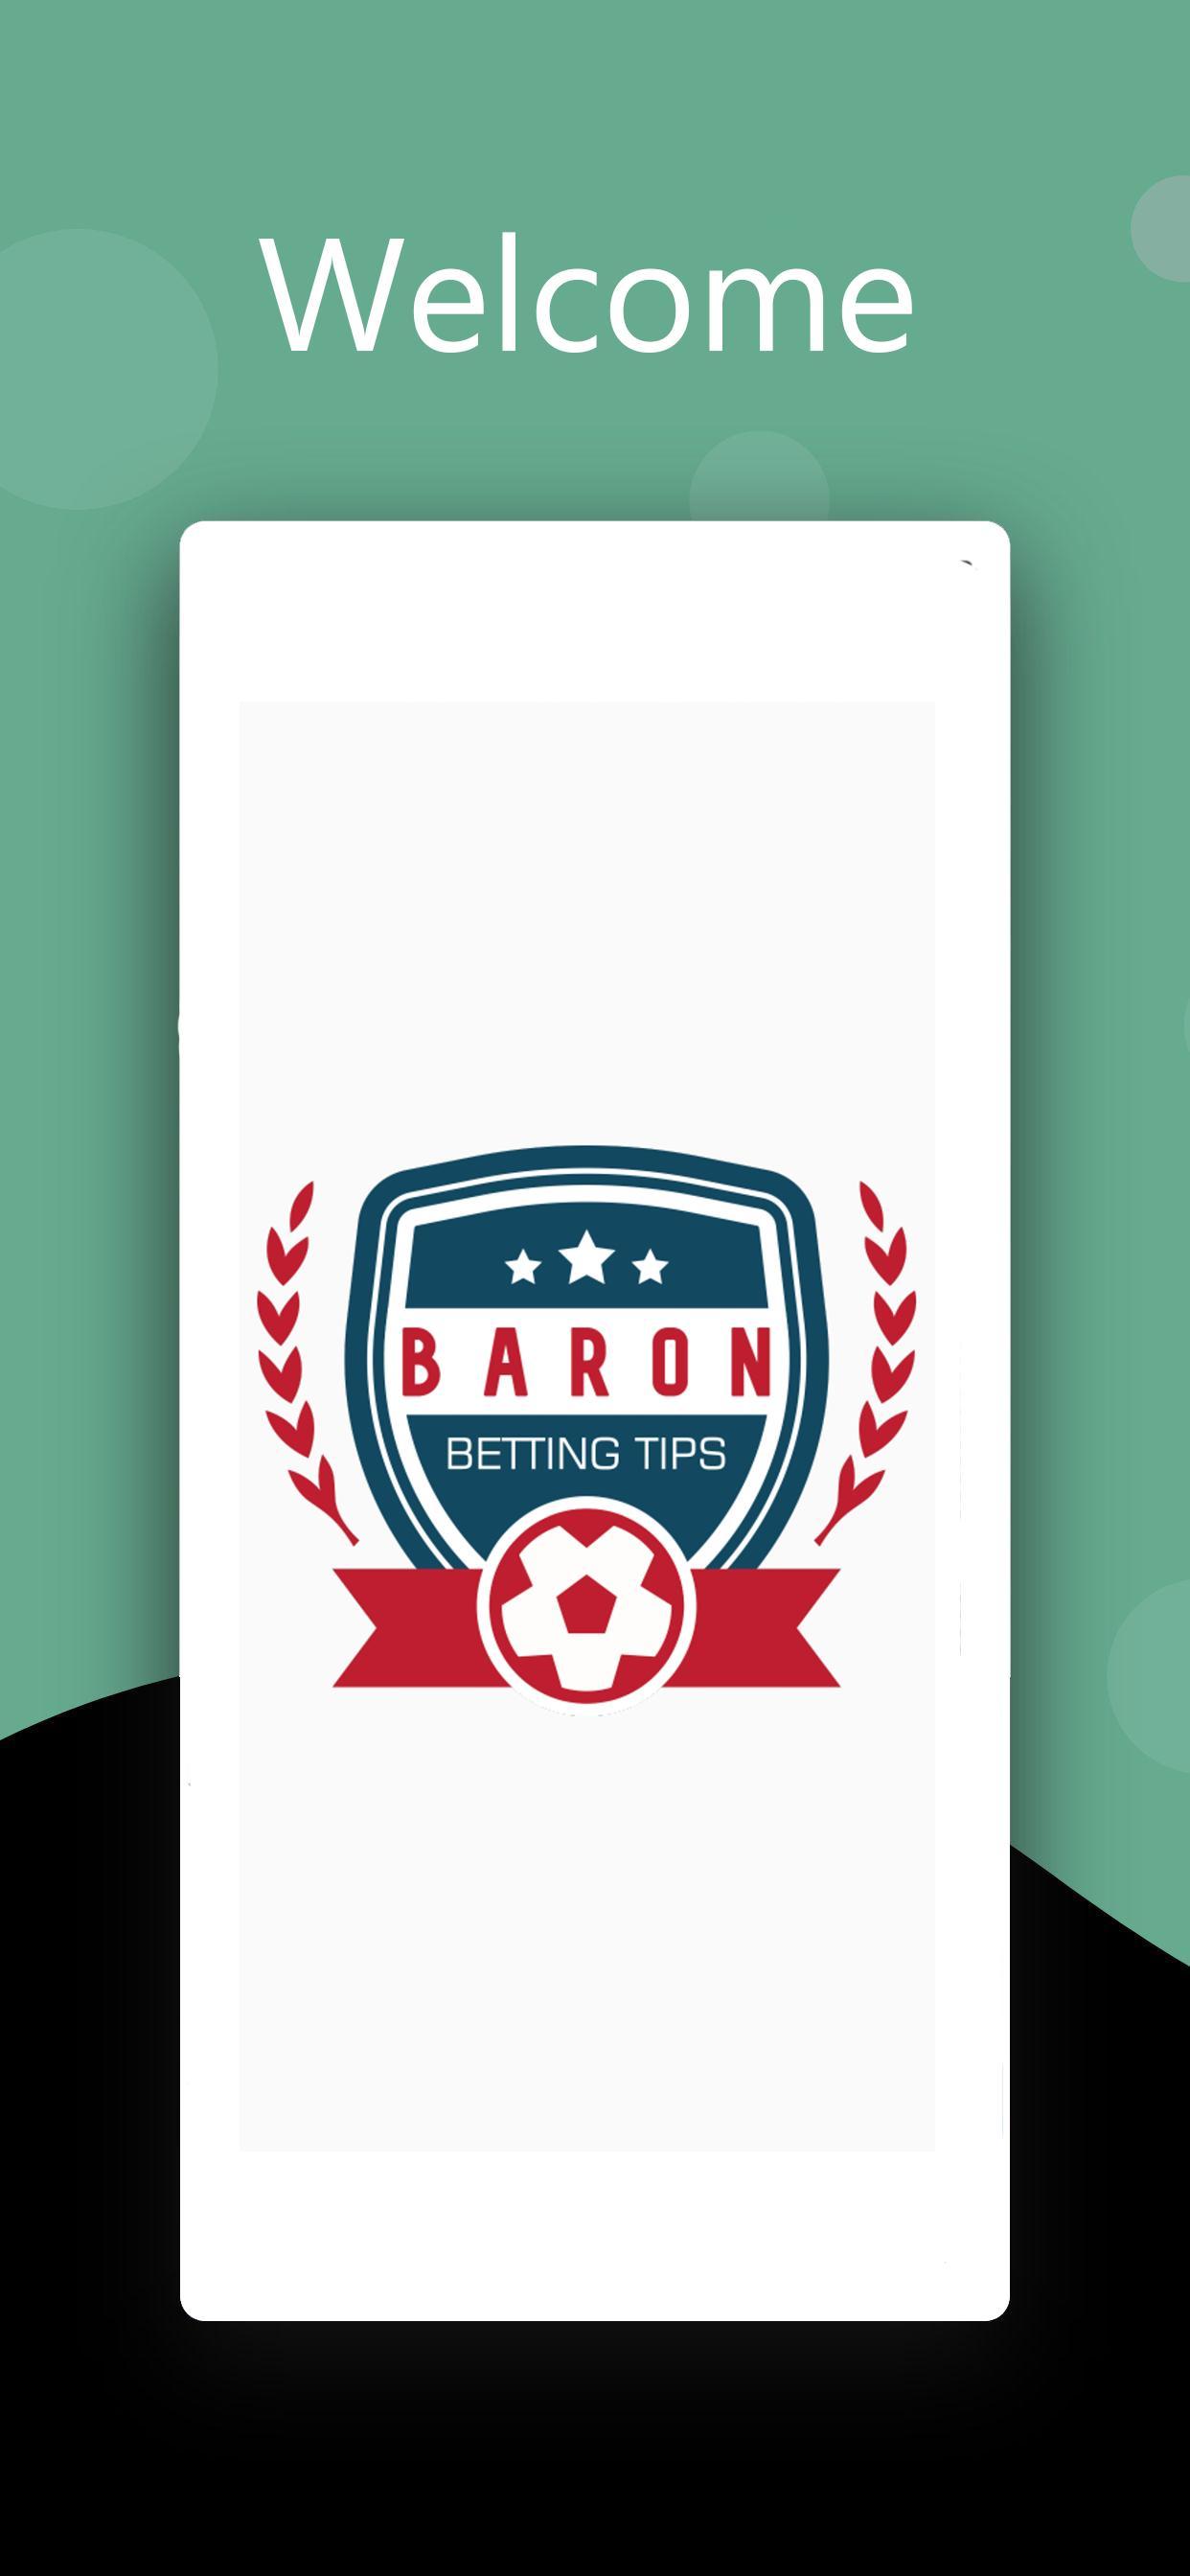 Baron betting app download software